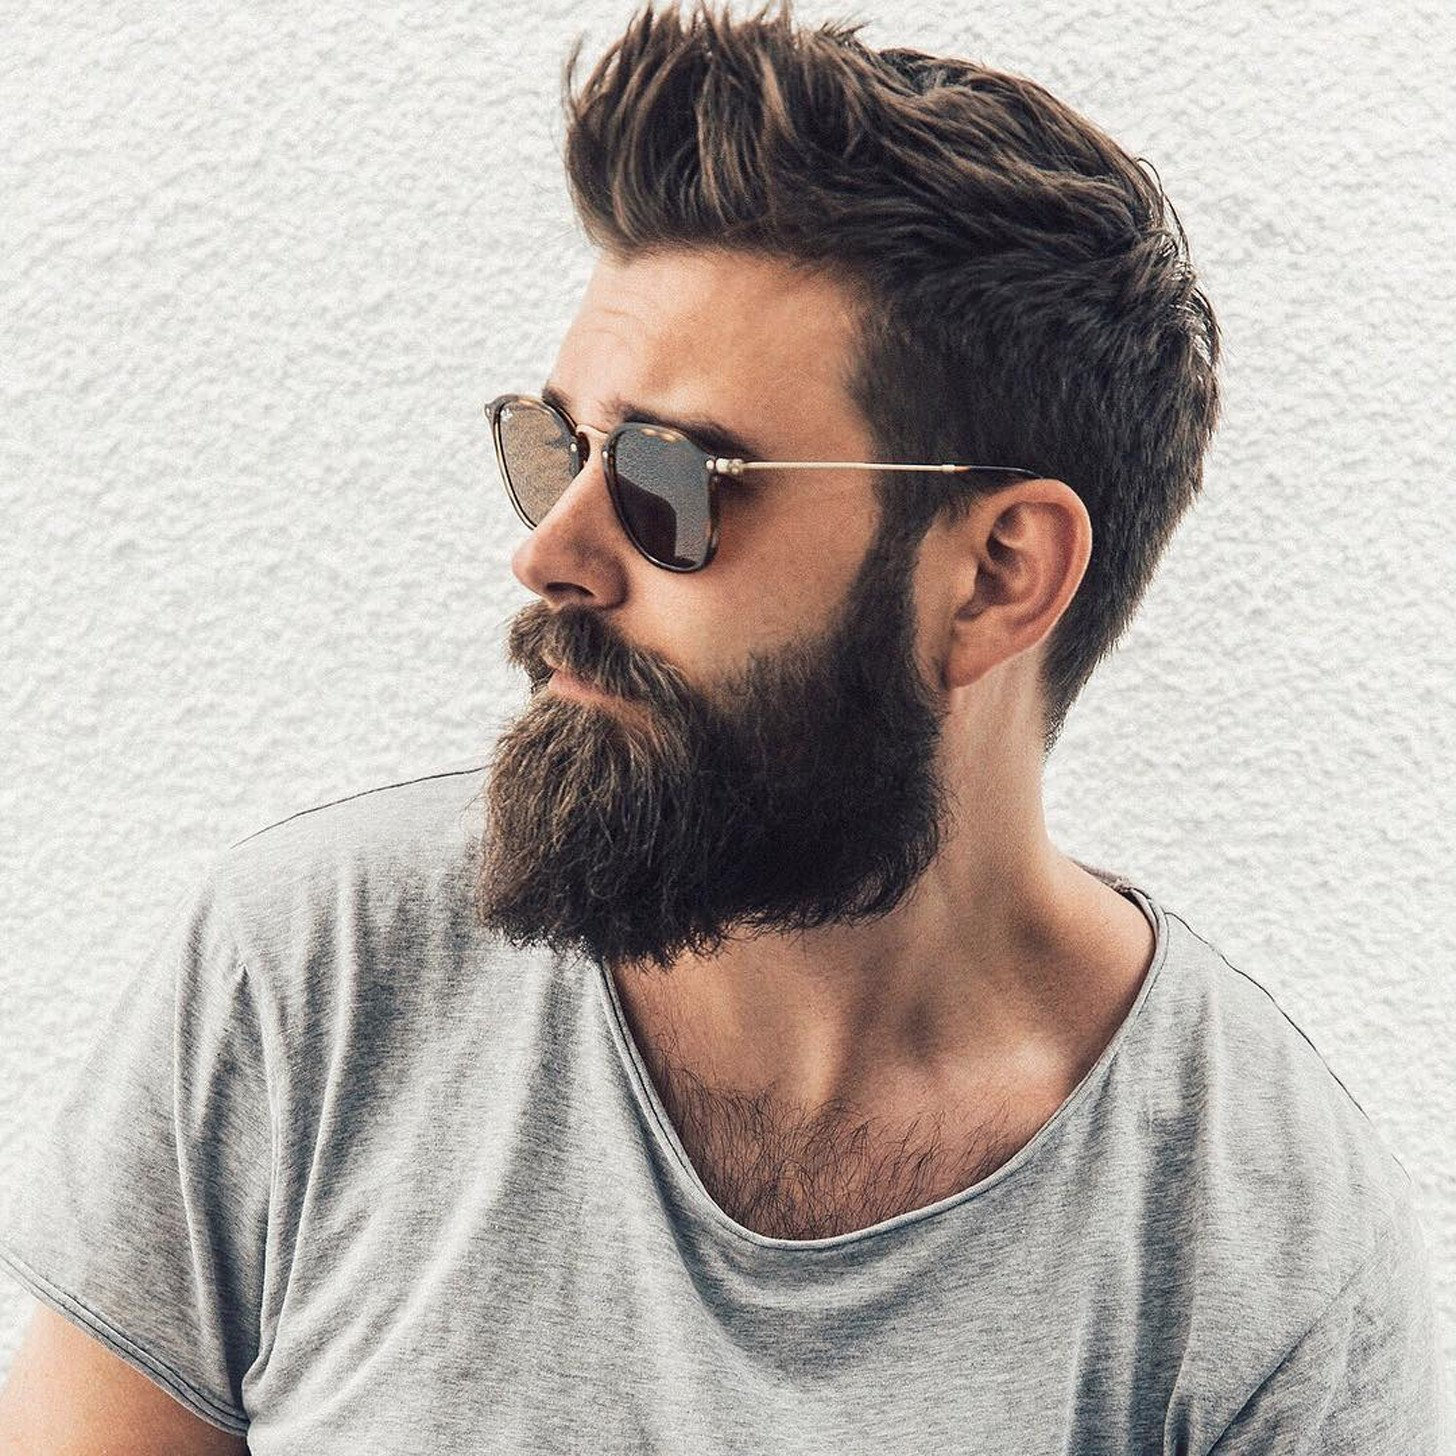 free photo bearded man man male one free download jooinn